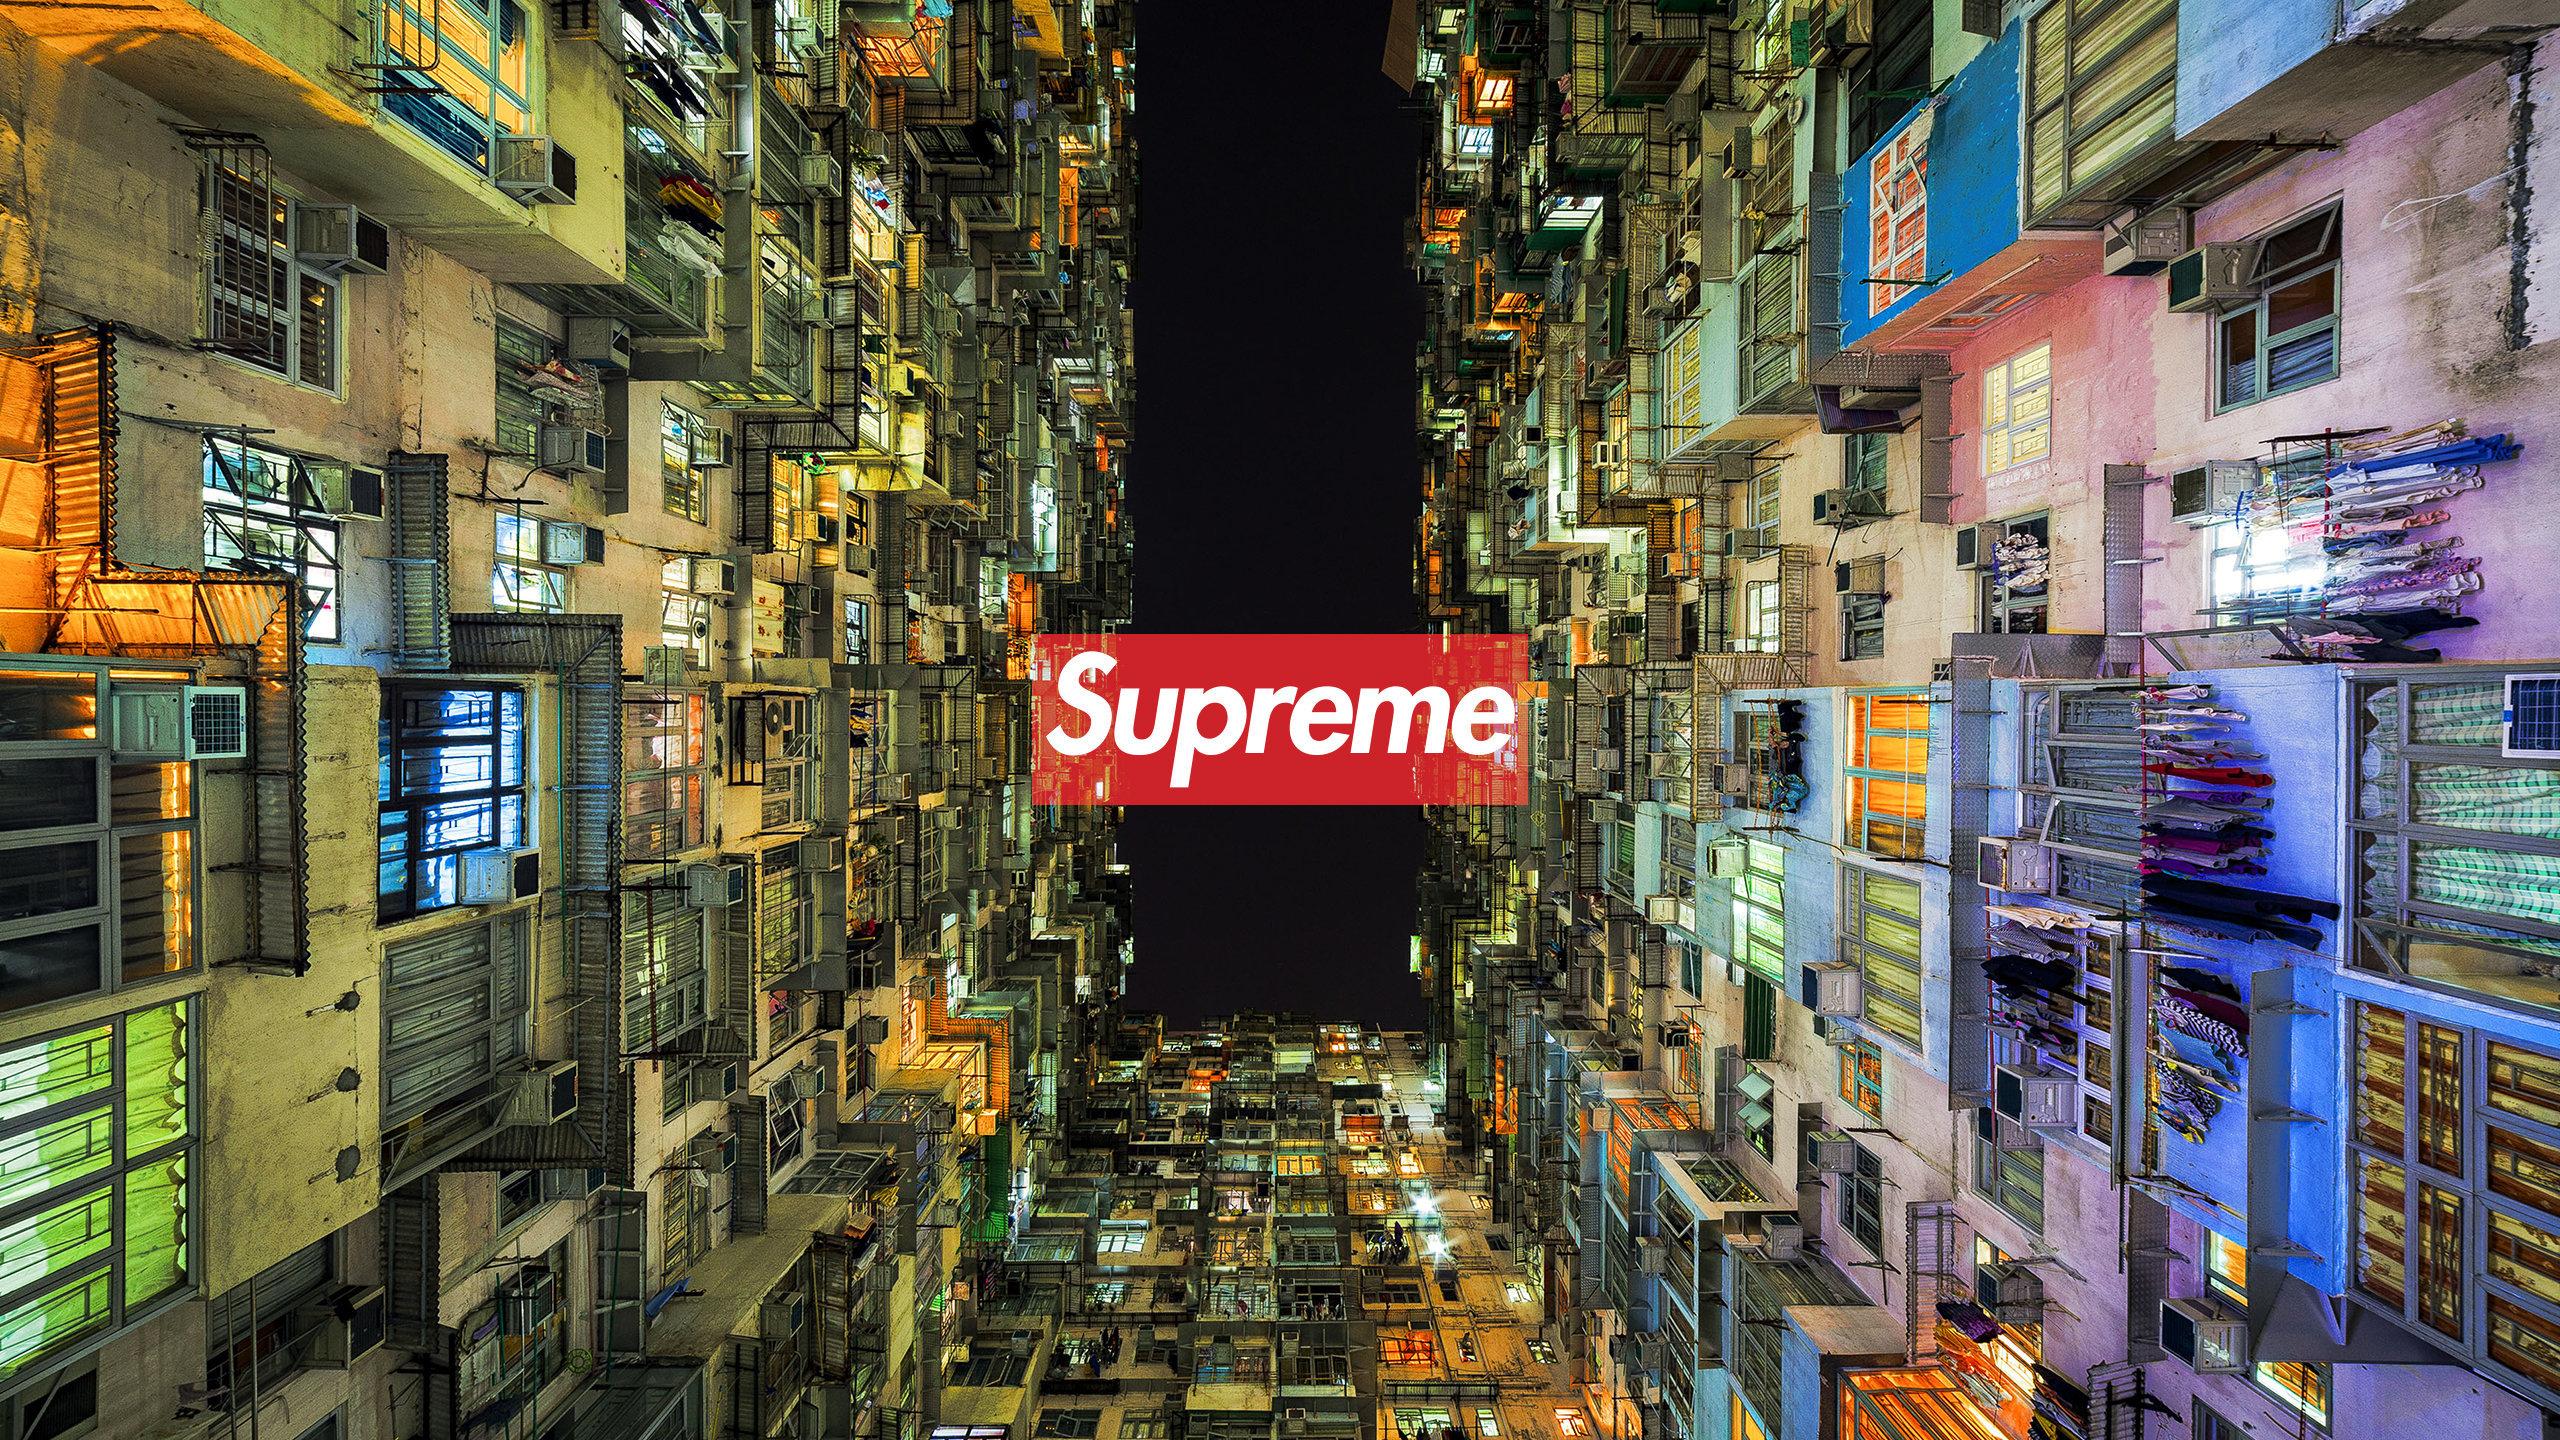 52 Supreme Hd Wallpapers On Wallpapersafari